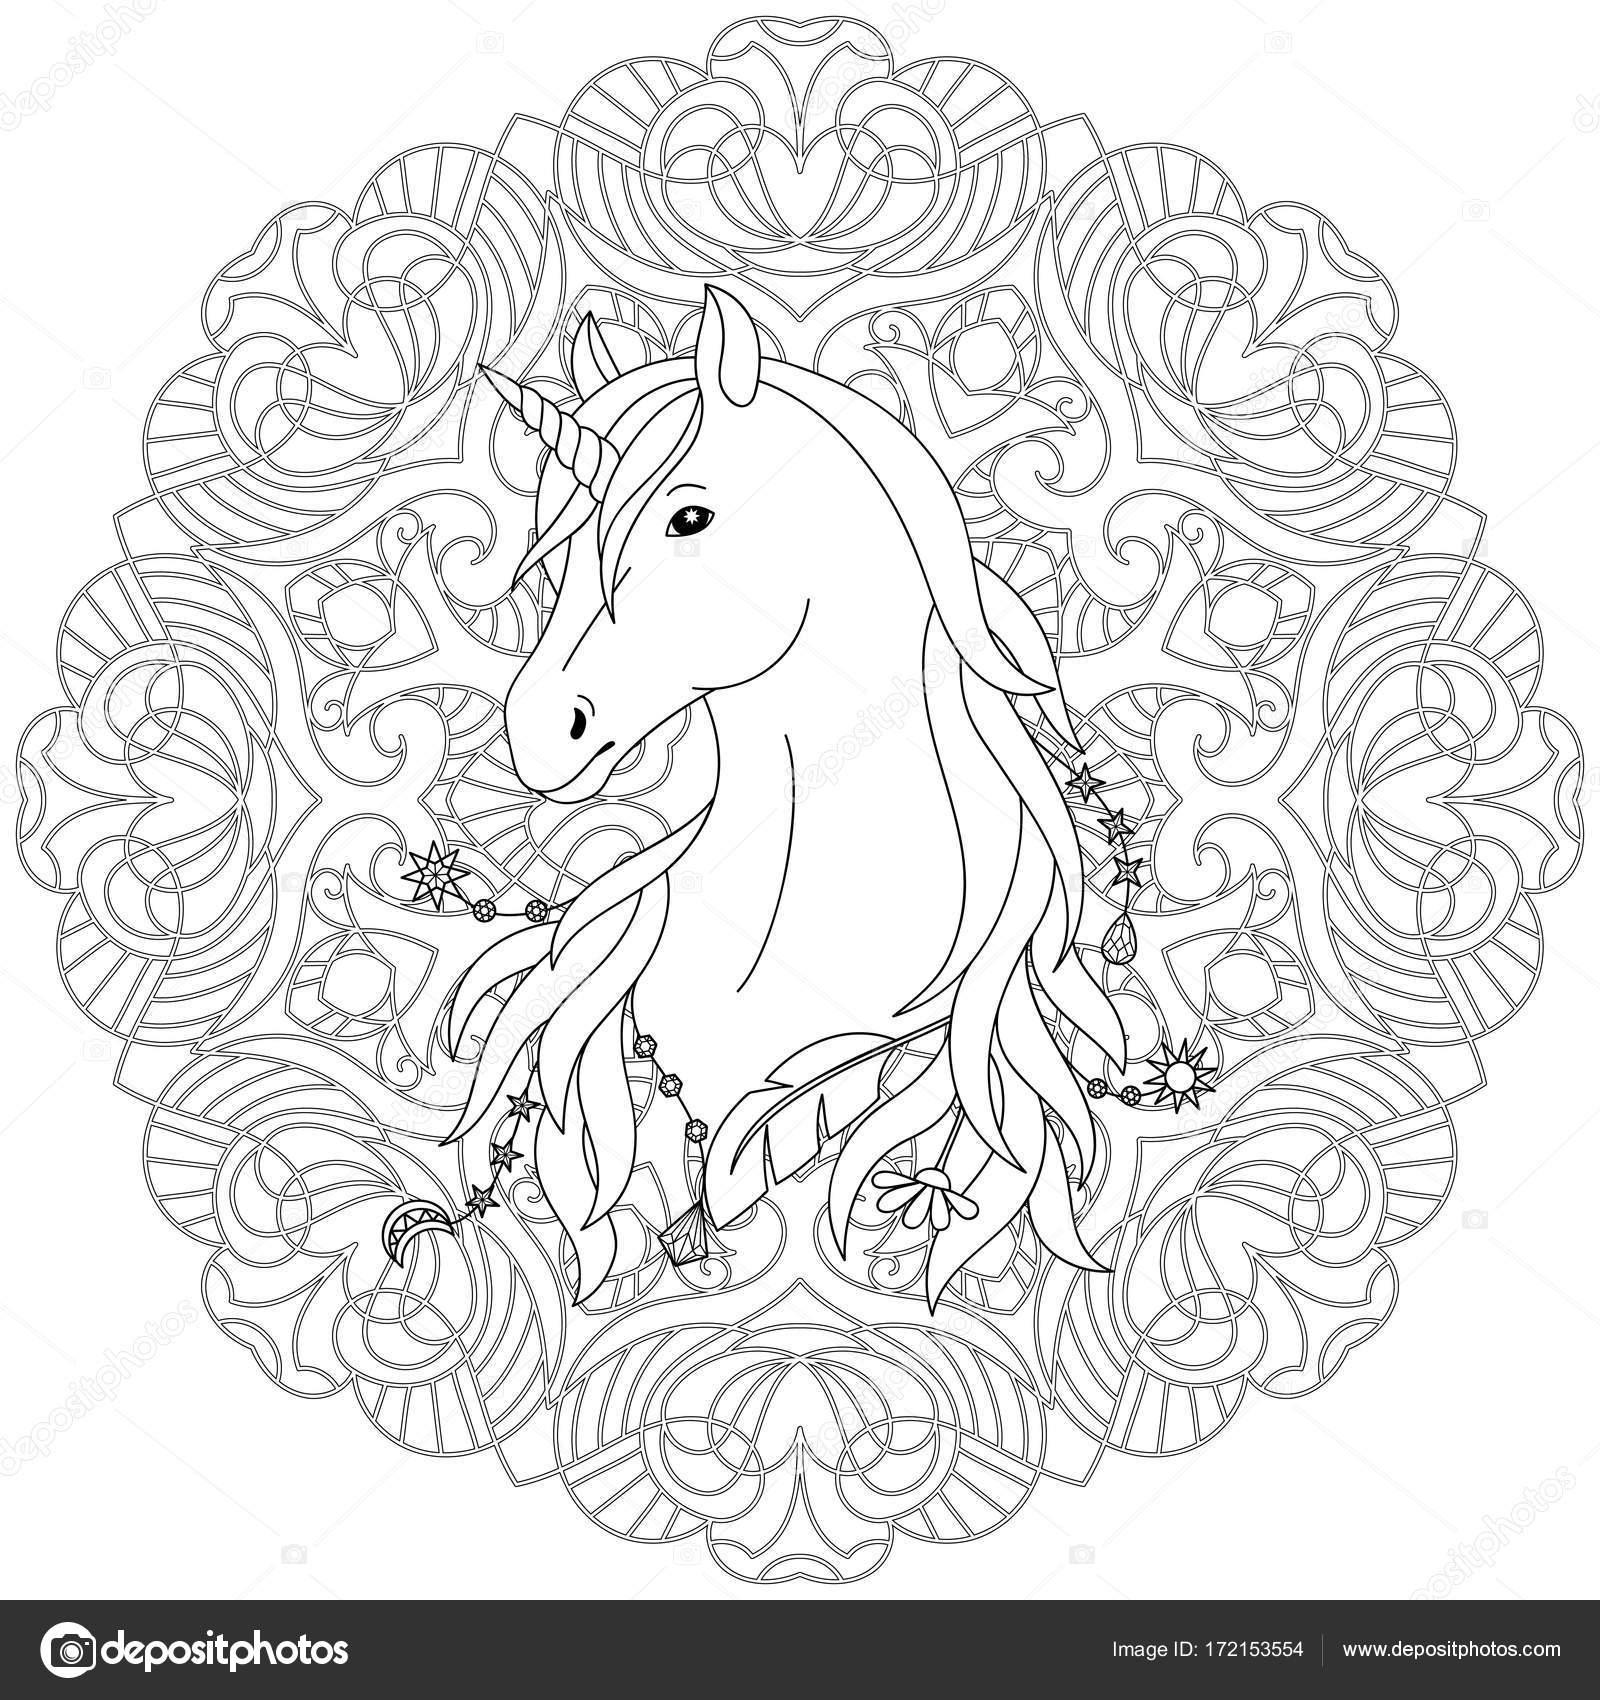 Unicorn Tattoo Kleurplaat Stockvector C Kronalux 172153554